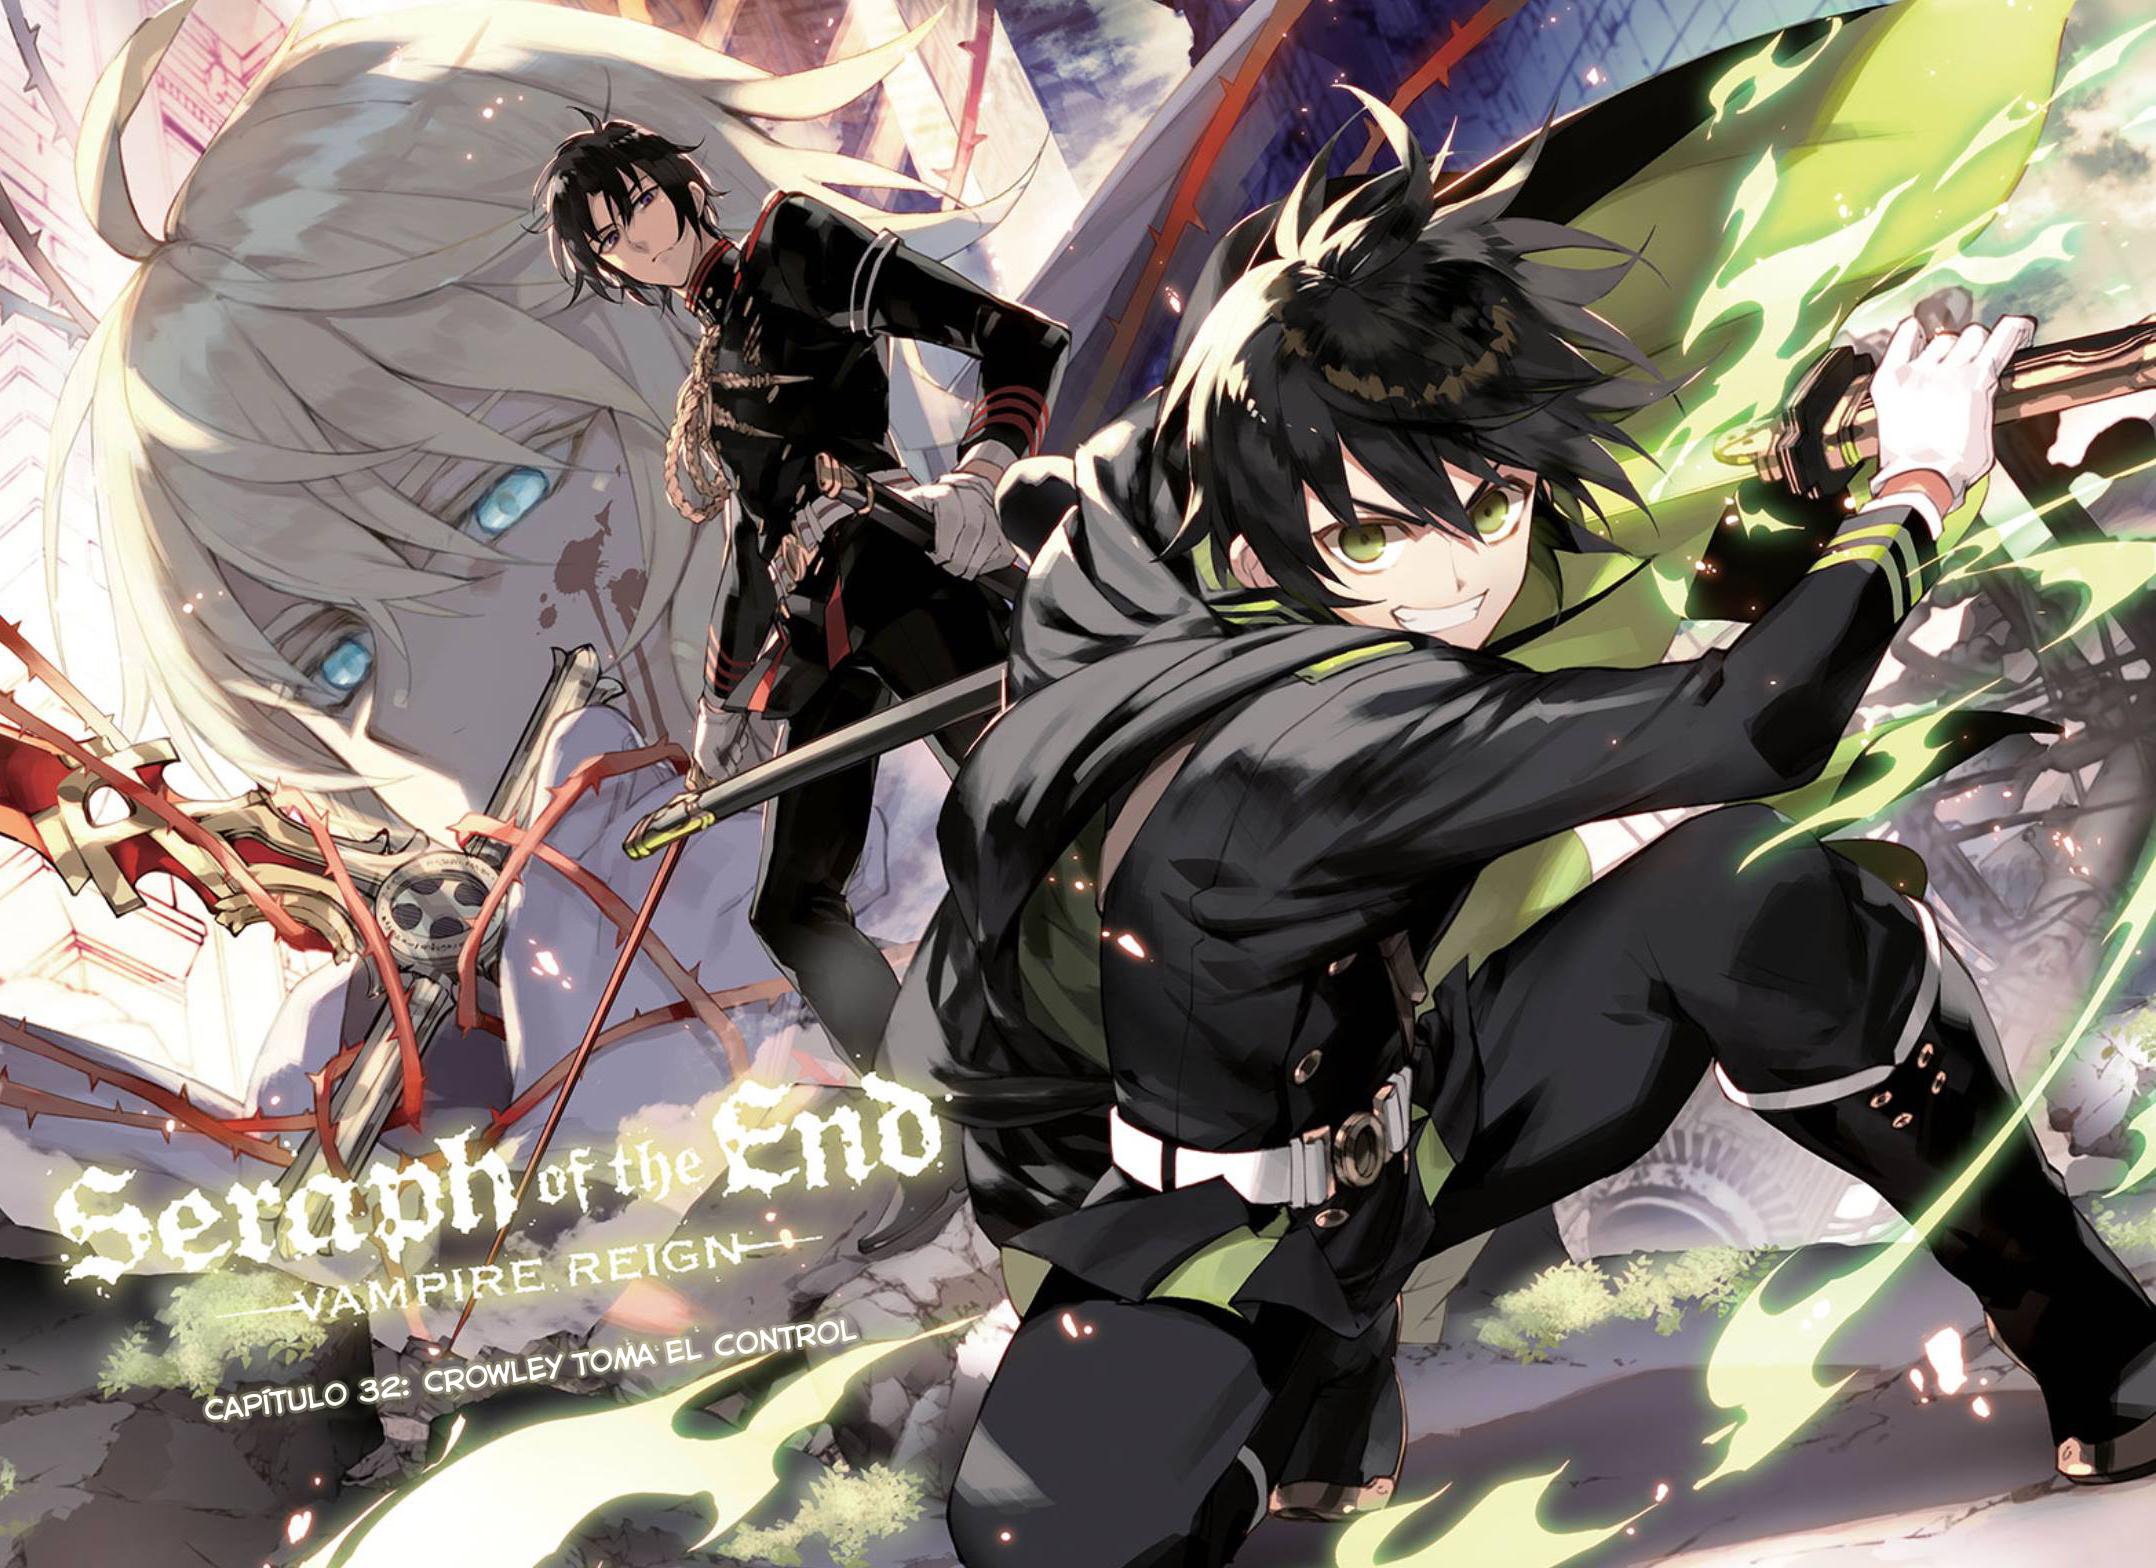 http://c5.ninemanga.com/es_manga/49/3057/354600/24c4956895c4306379102956400b40f1.jpg Page 5